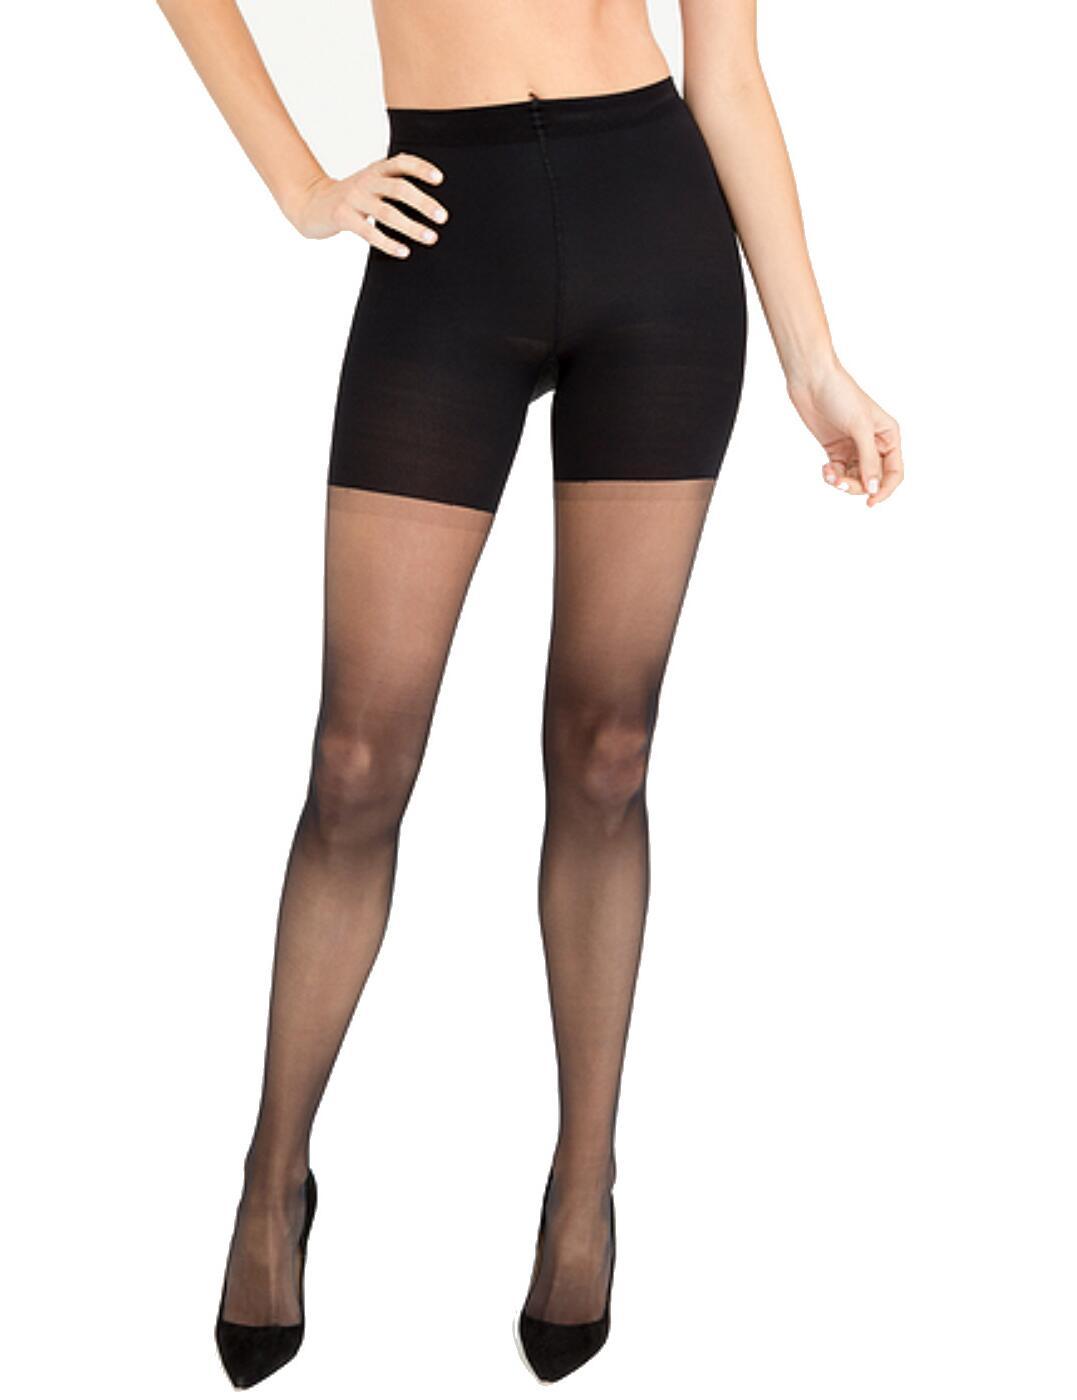 20025R Spanx Sheers Luxe Leg  - 20025R Very Black